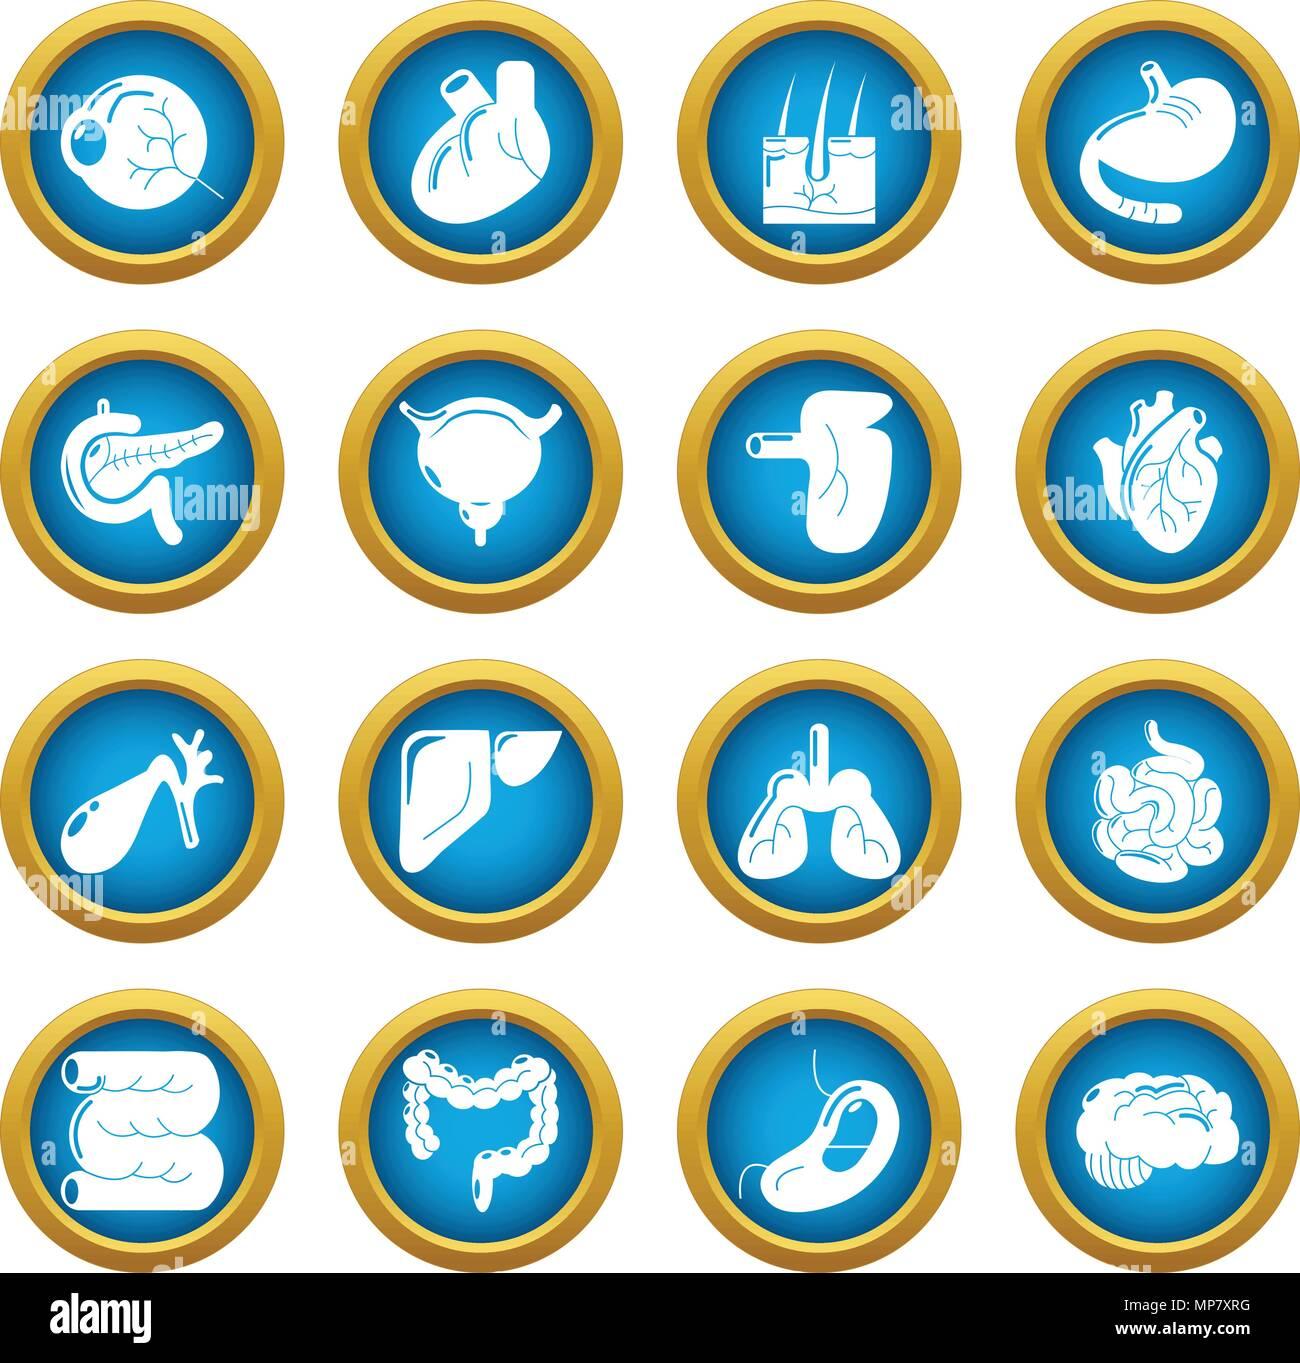 Internal human organs icons set, simple style - Stock Image